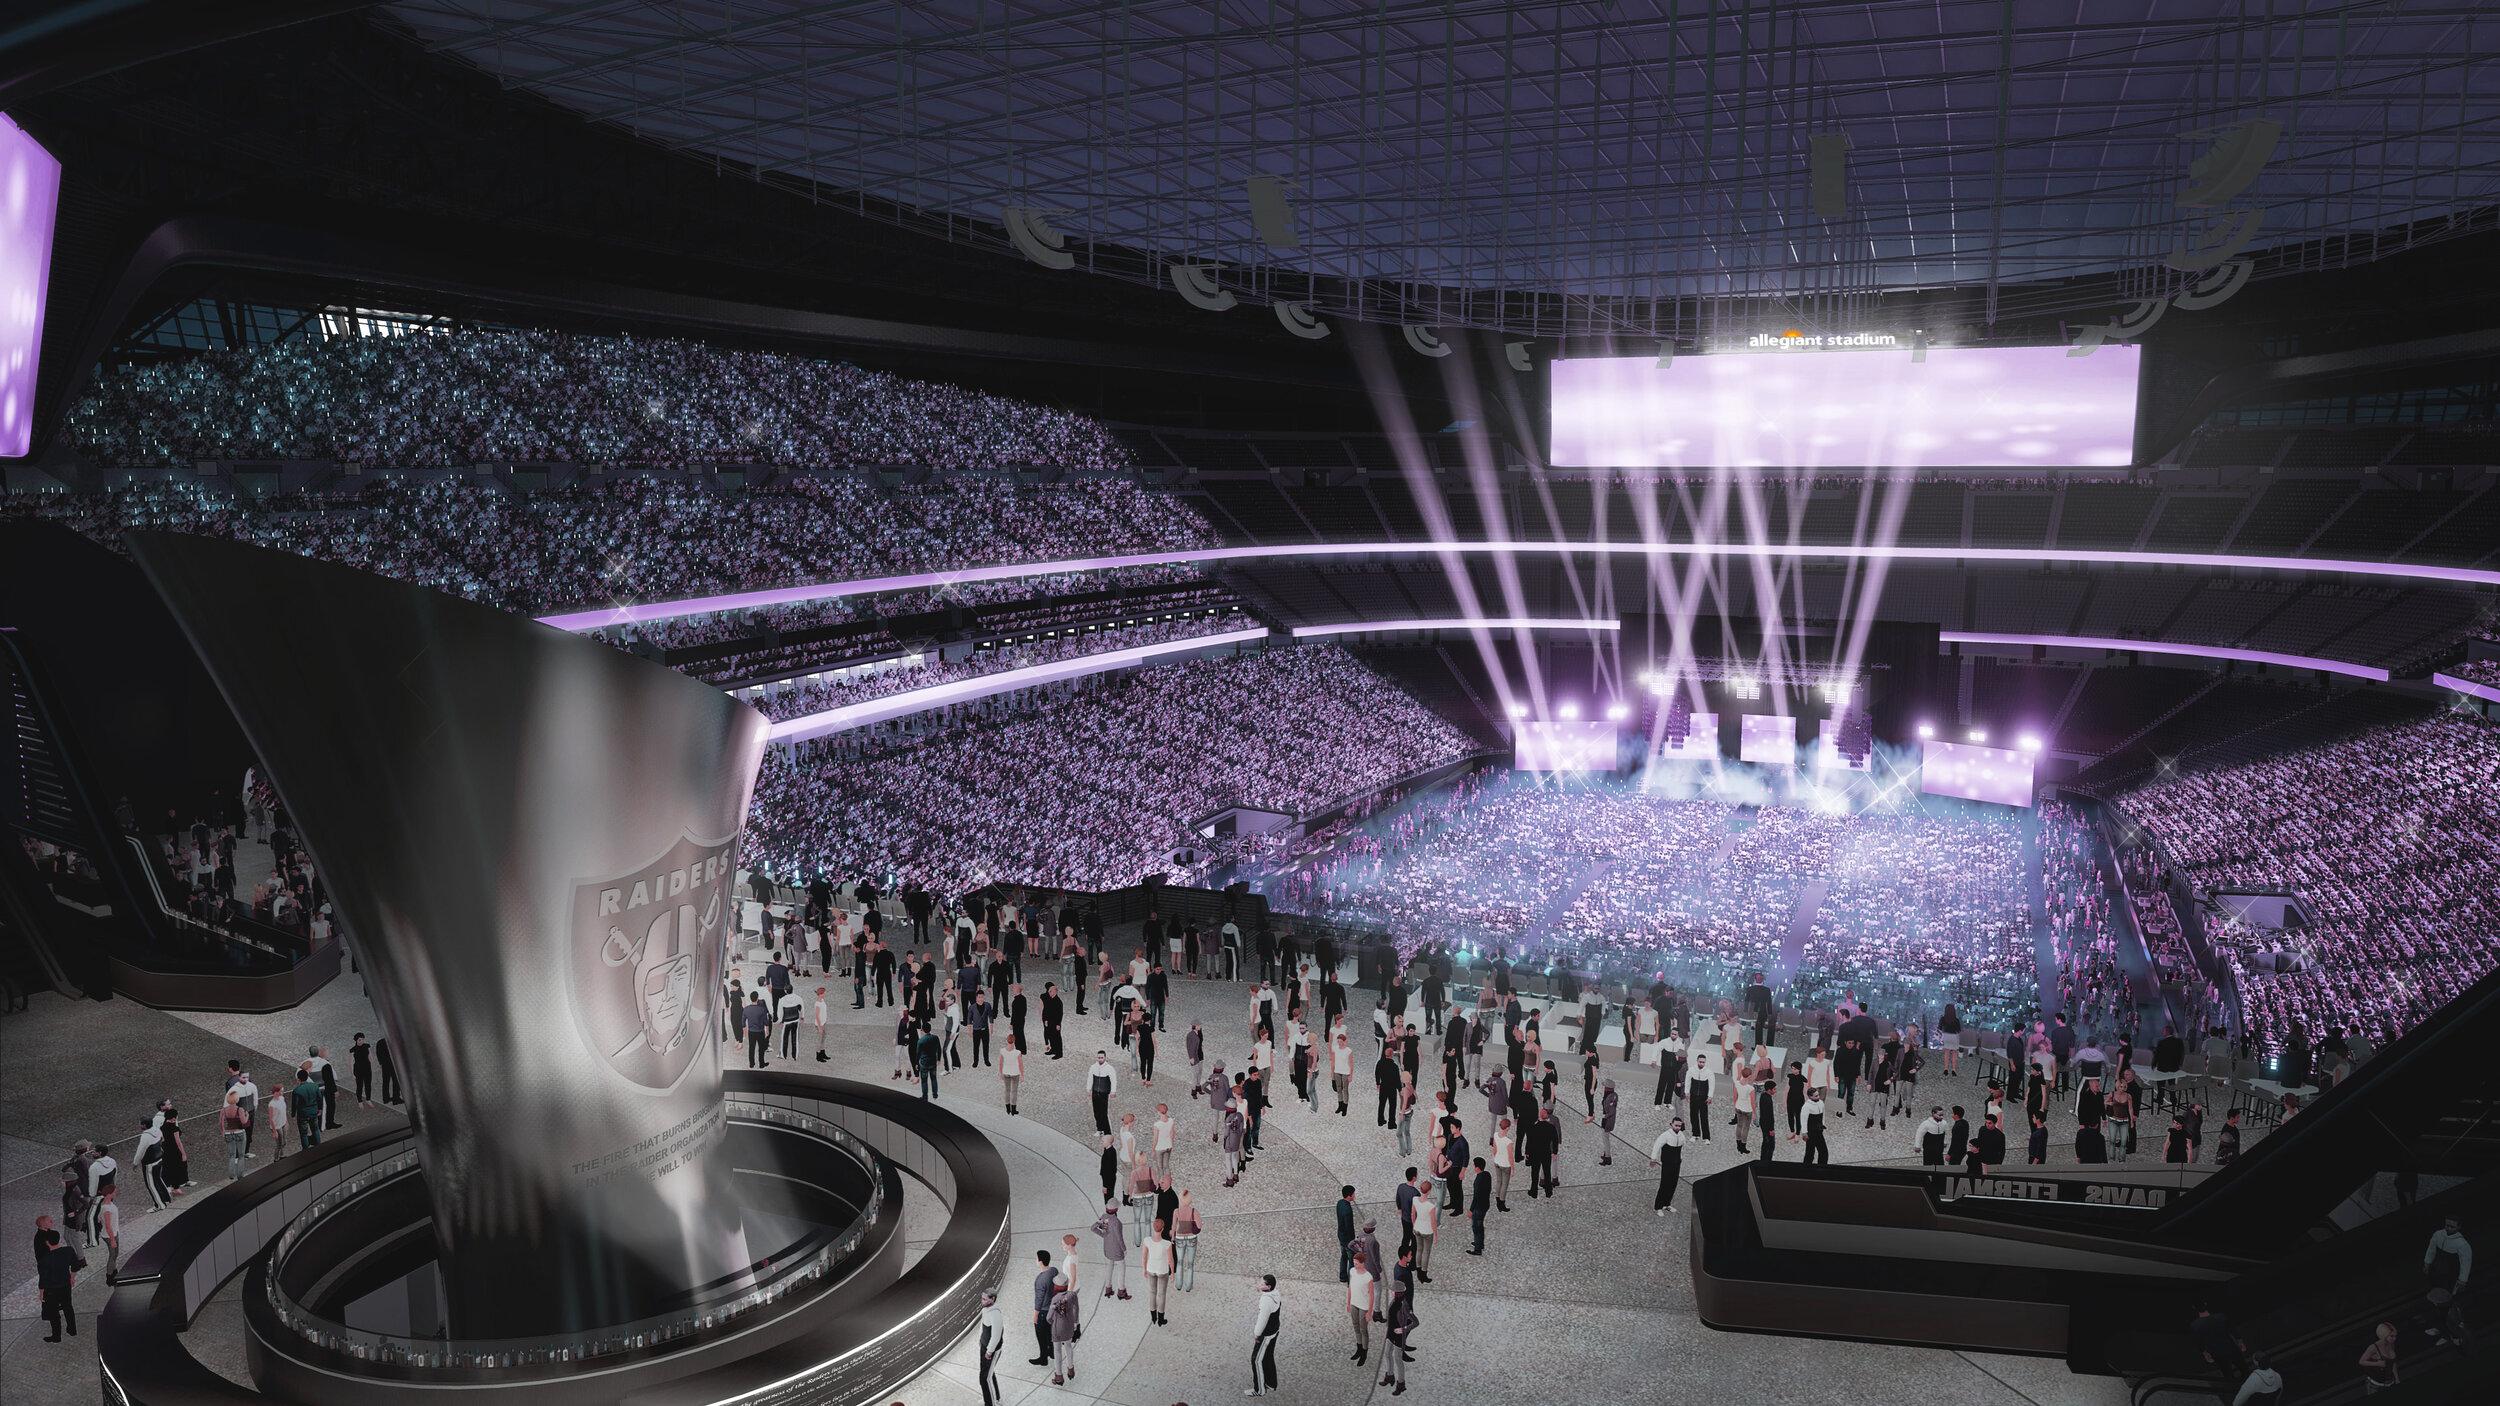 Las Vegas Concert.jpg